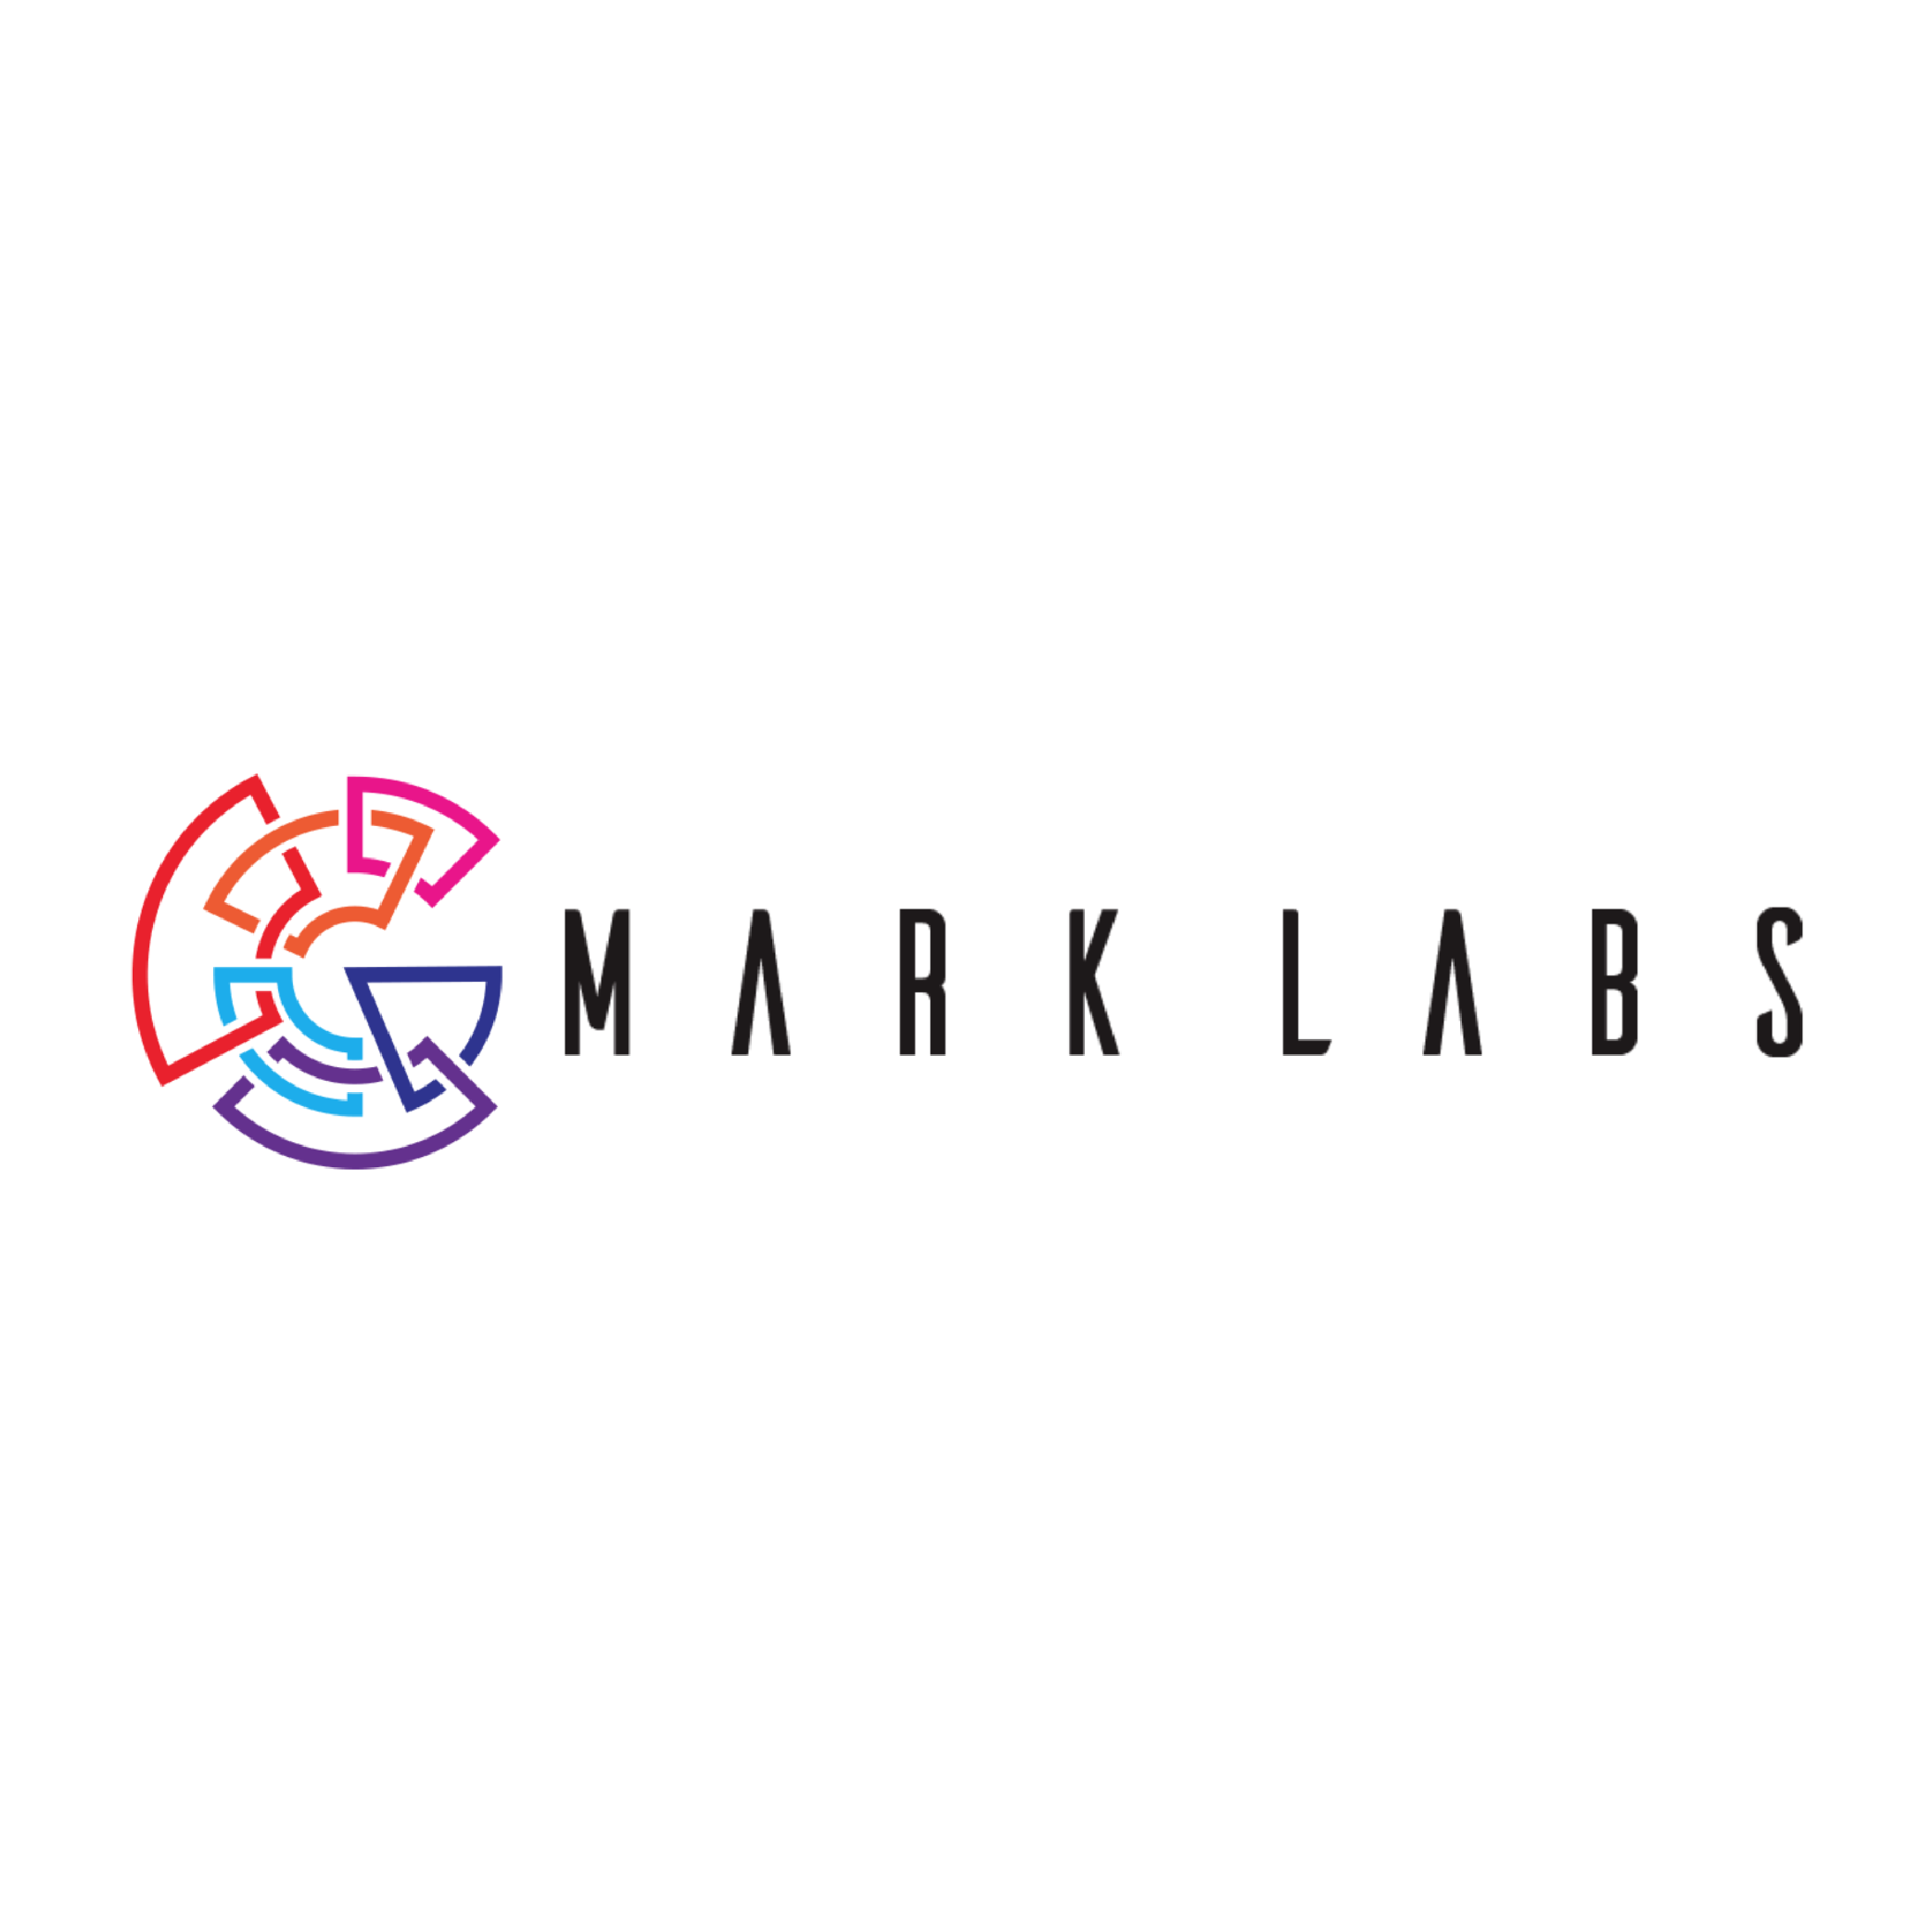 Mark Labs